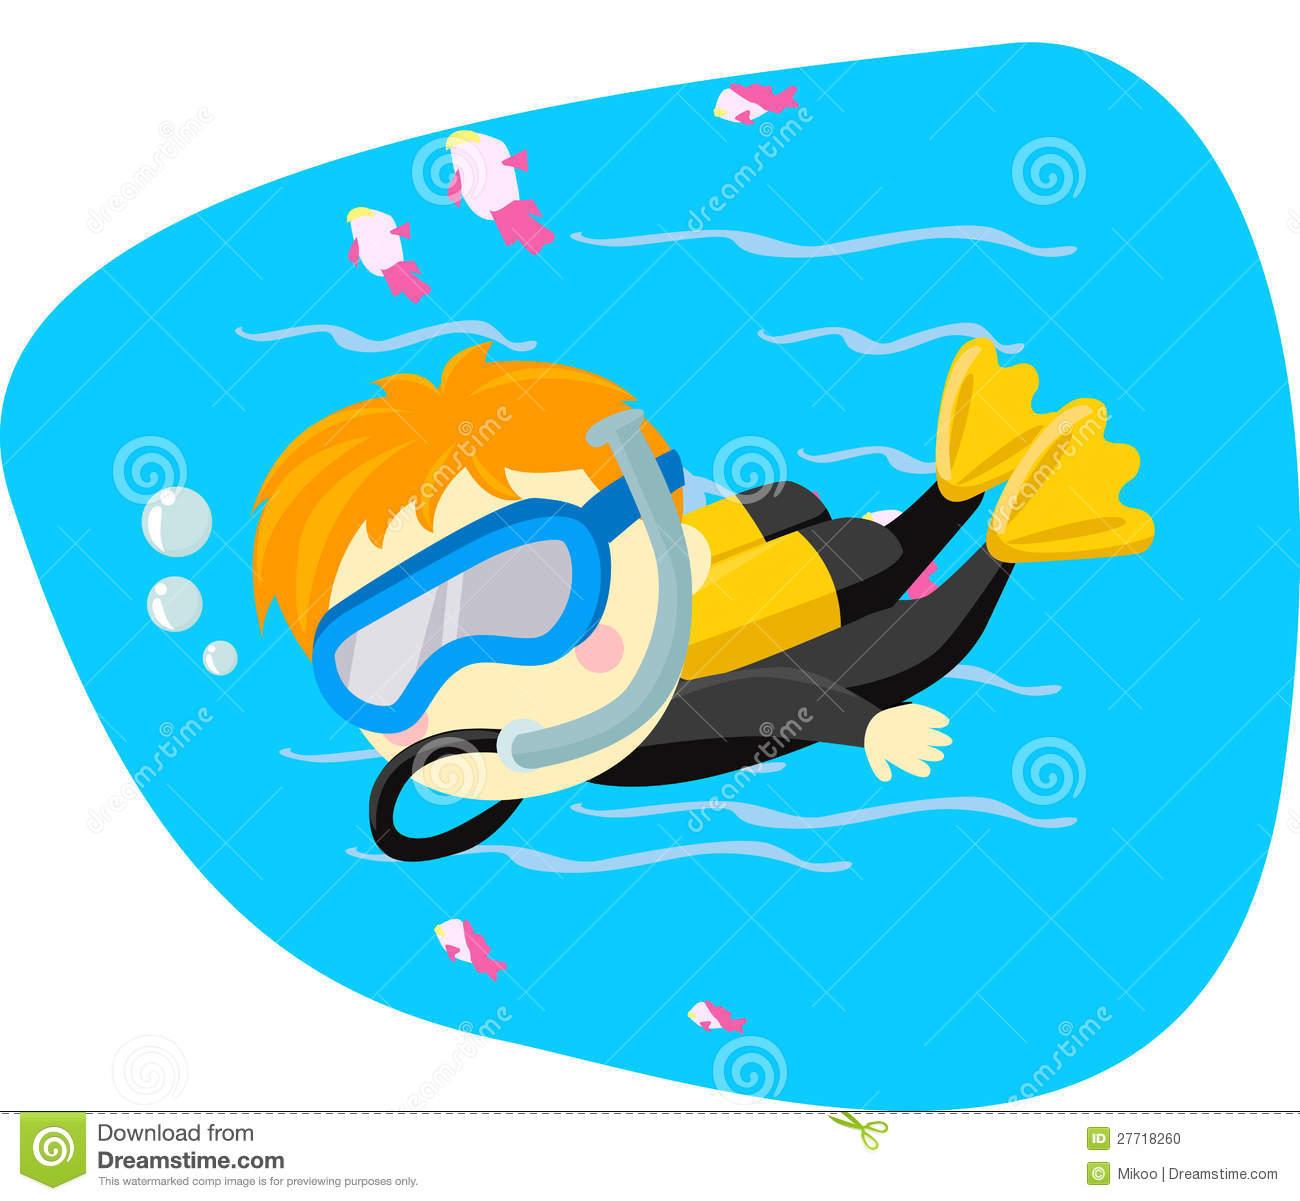 Scuba Diver clipart scuba gear #4